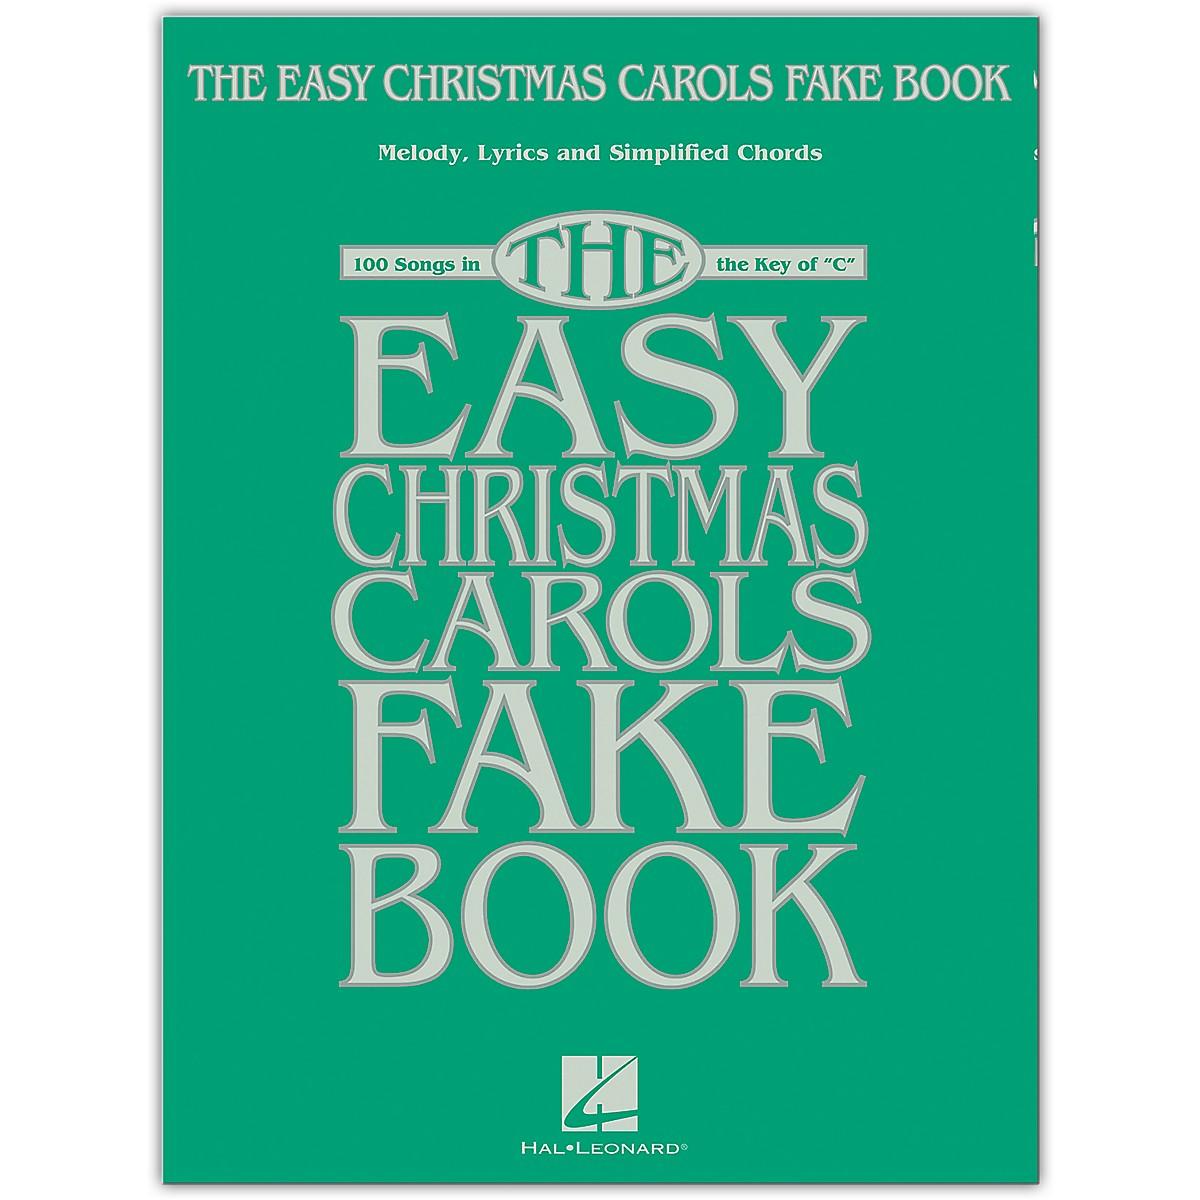 Hal Leonard The Easy Christmas Carols Fake Book - Melody, Lyrics & Simplified Chords in the Key of C